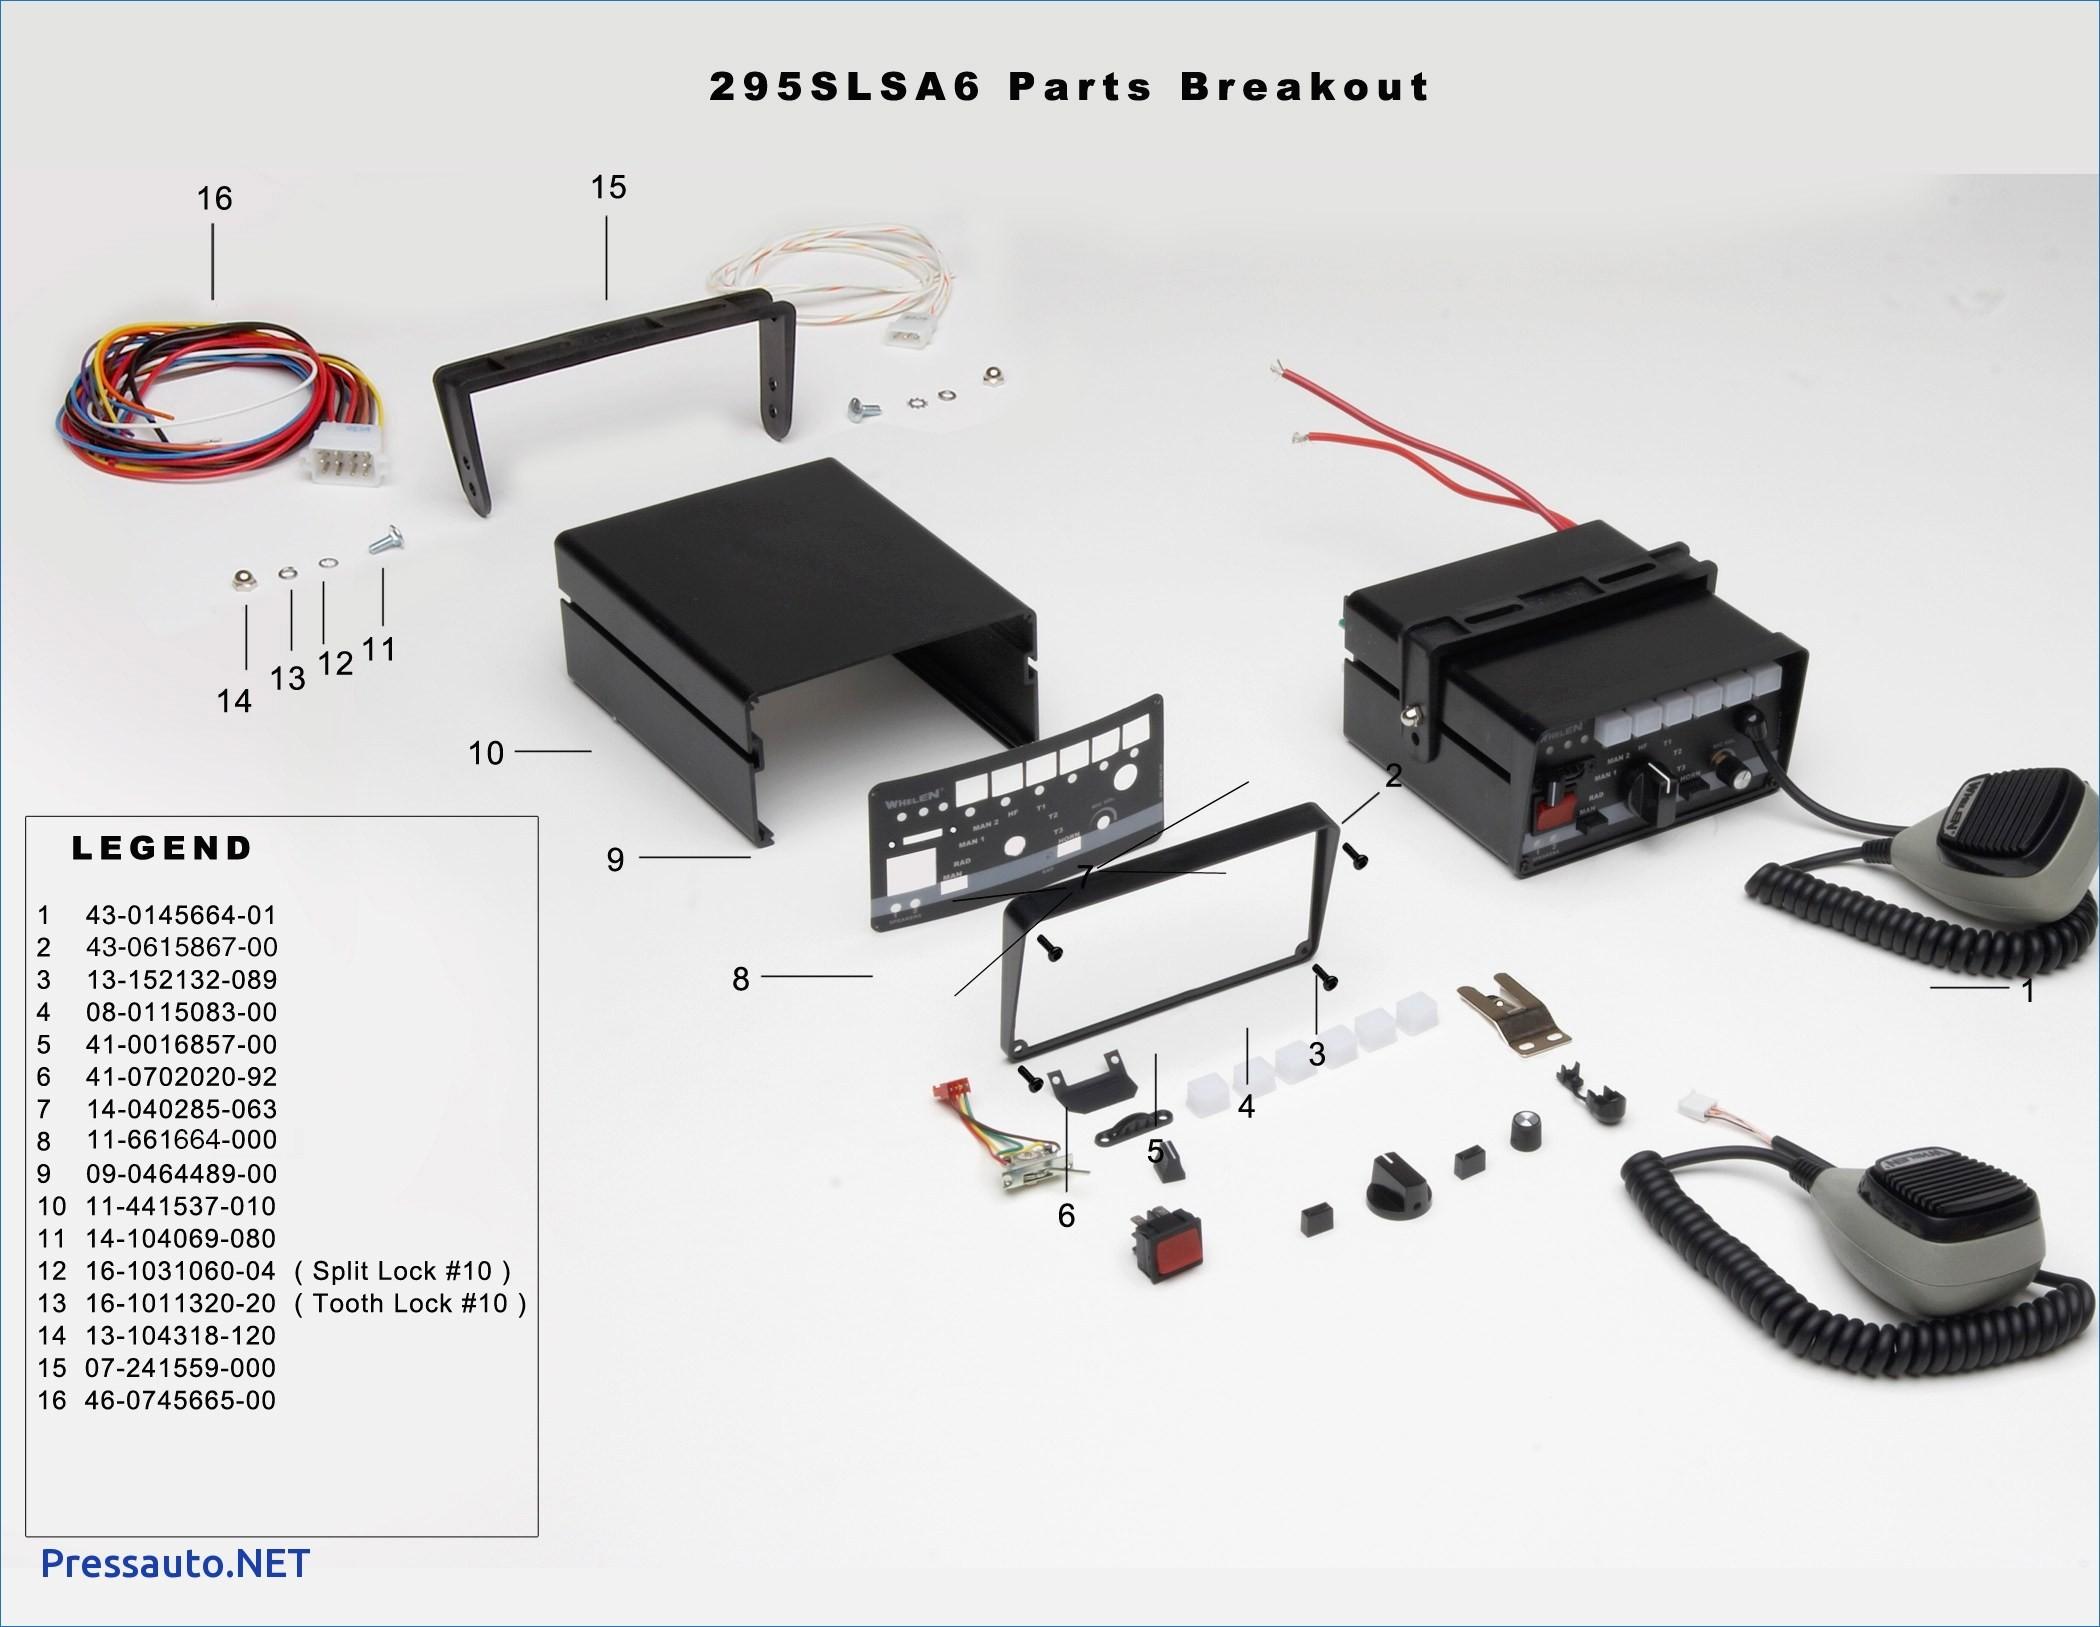 whelen siren wiring diagram unusual whelen 295slsa6 wiring diagram rh detoxicrecenze com Siren Whelen 295Hfsa6 Wiring-Diagram Box Whelen Siren 295SLSA6 Manual